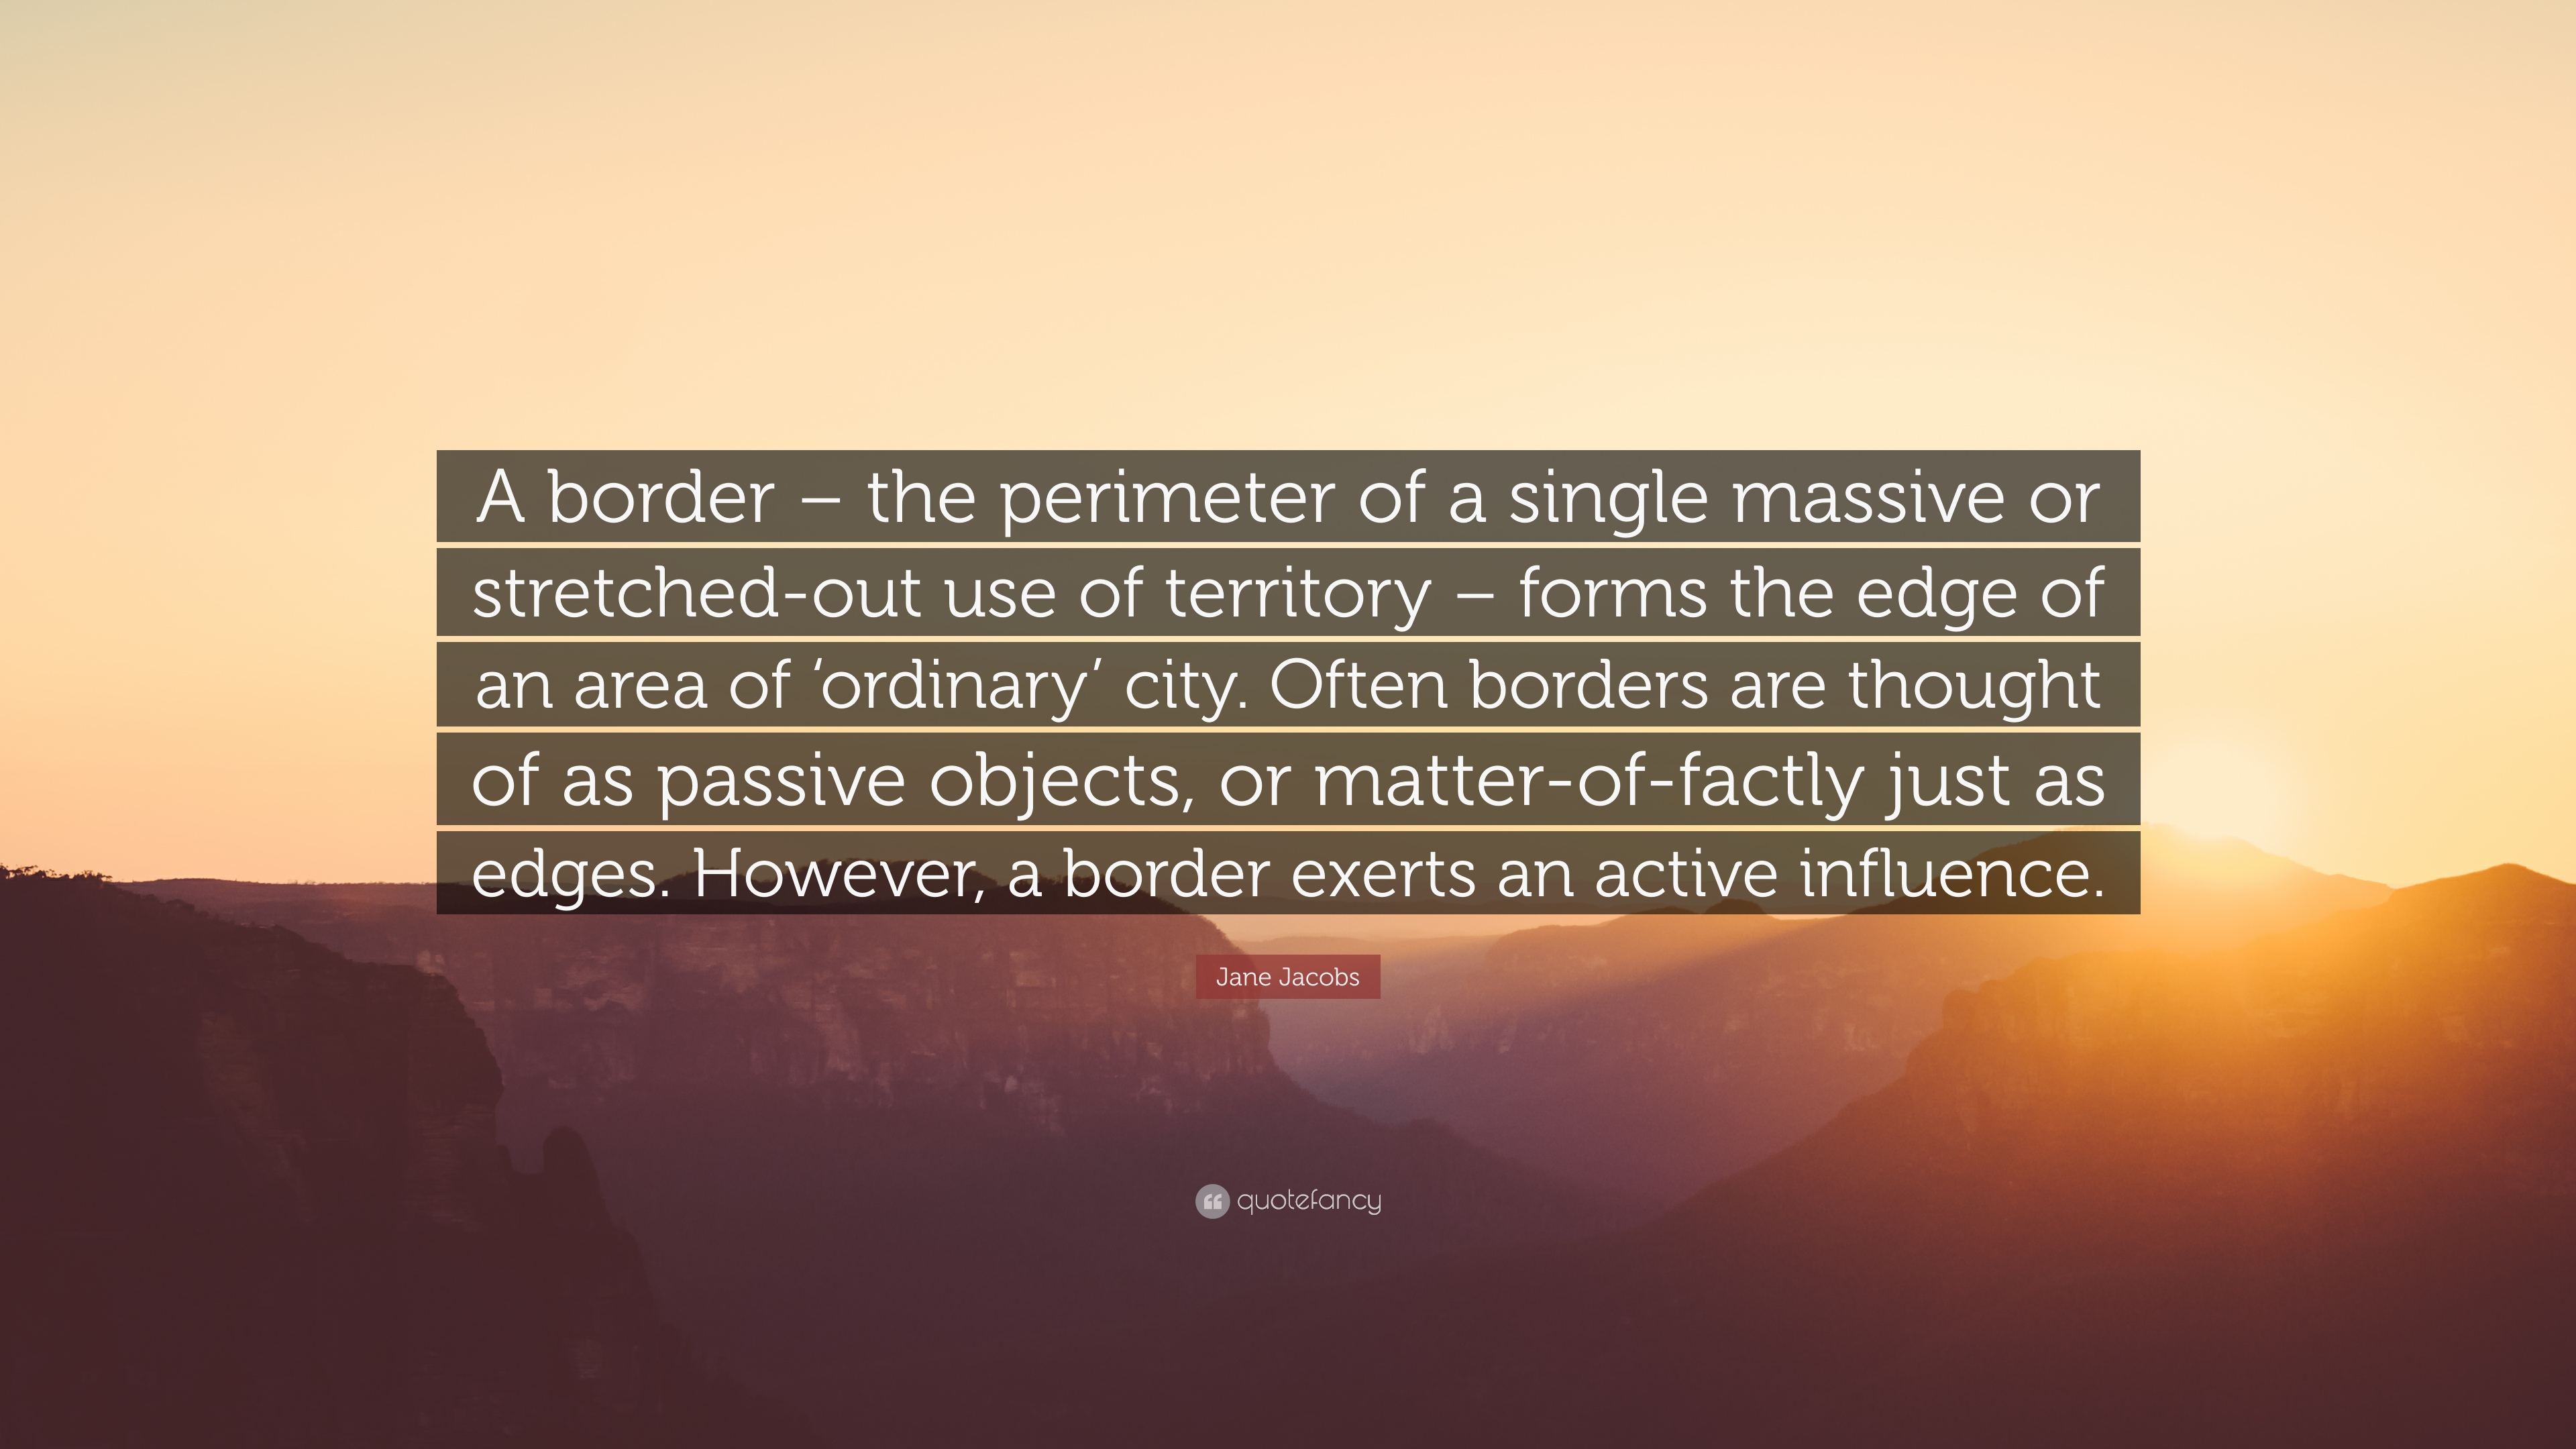 jane jacobs quote   u201ca border  u2013 the perimeter of a single massive or stretched